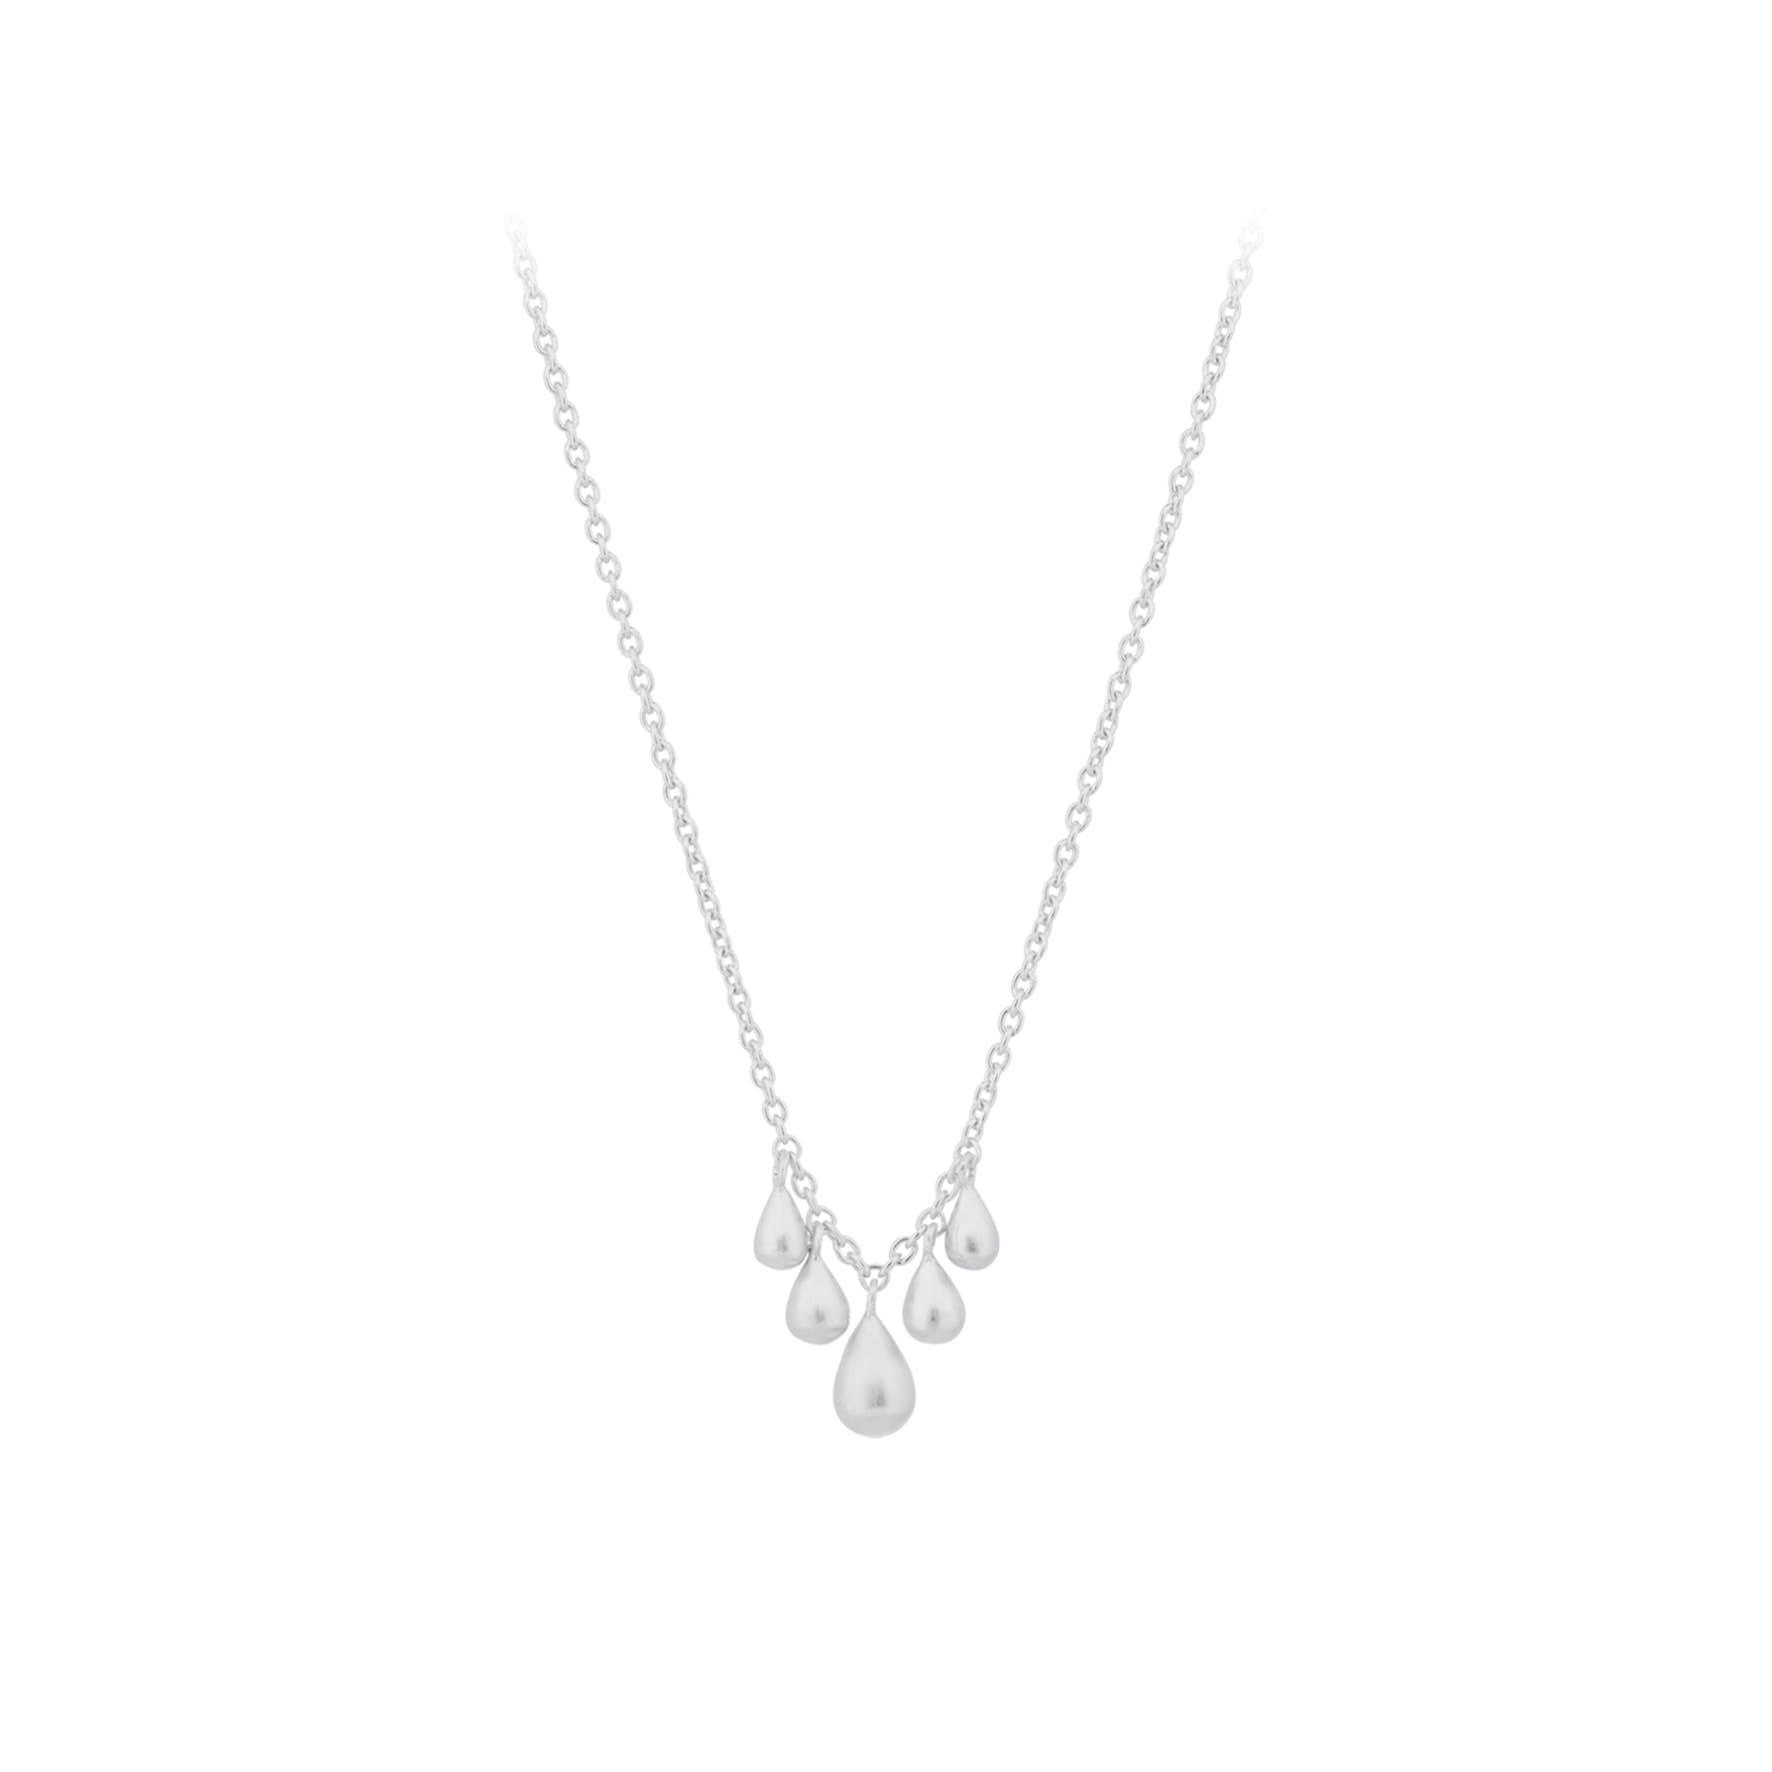 Waterdrop Necklace von Pernille Corydon in Silber Sterling 925